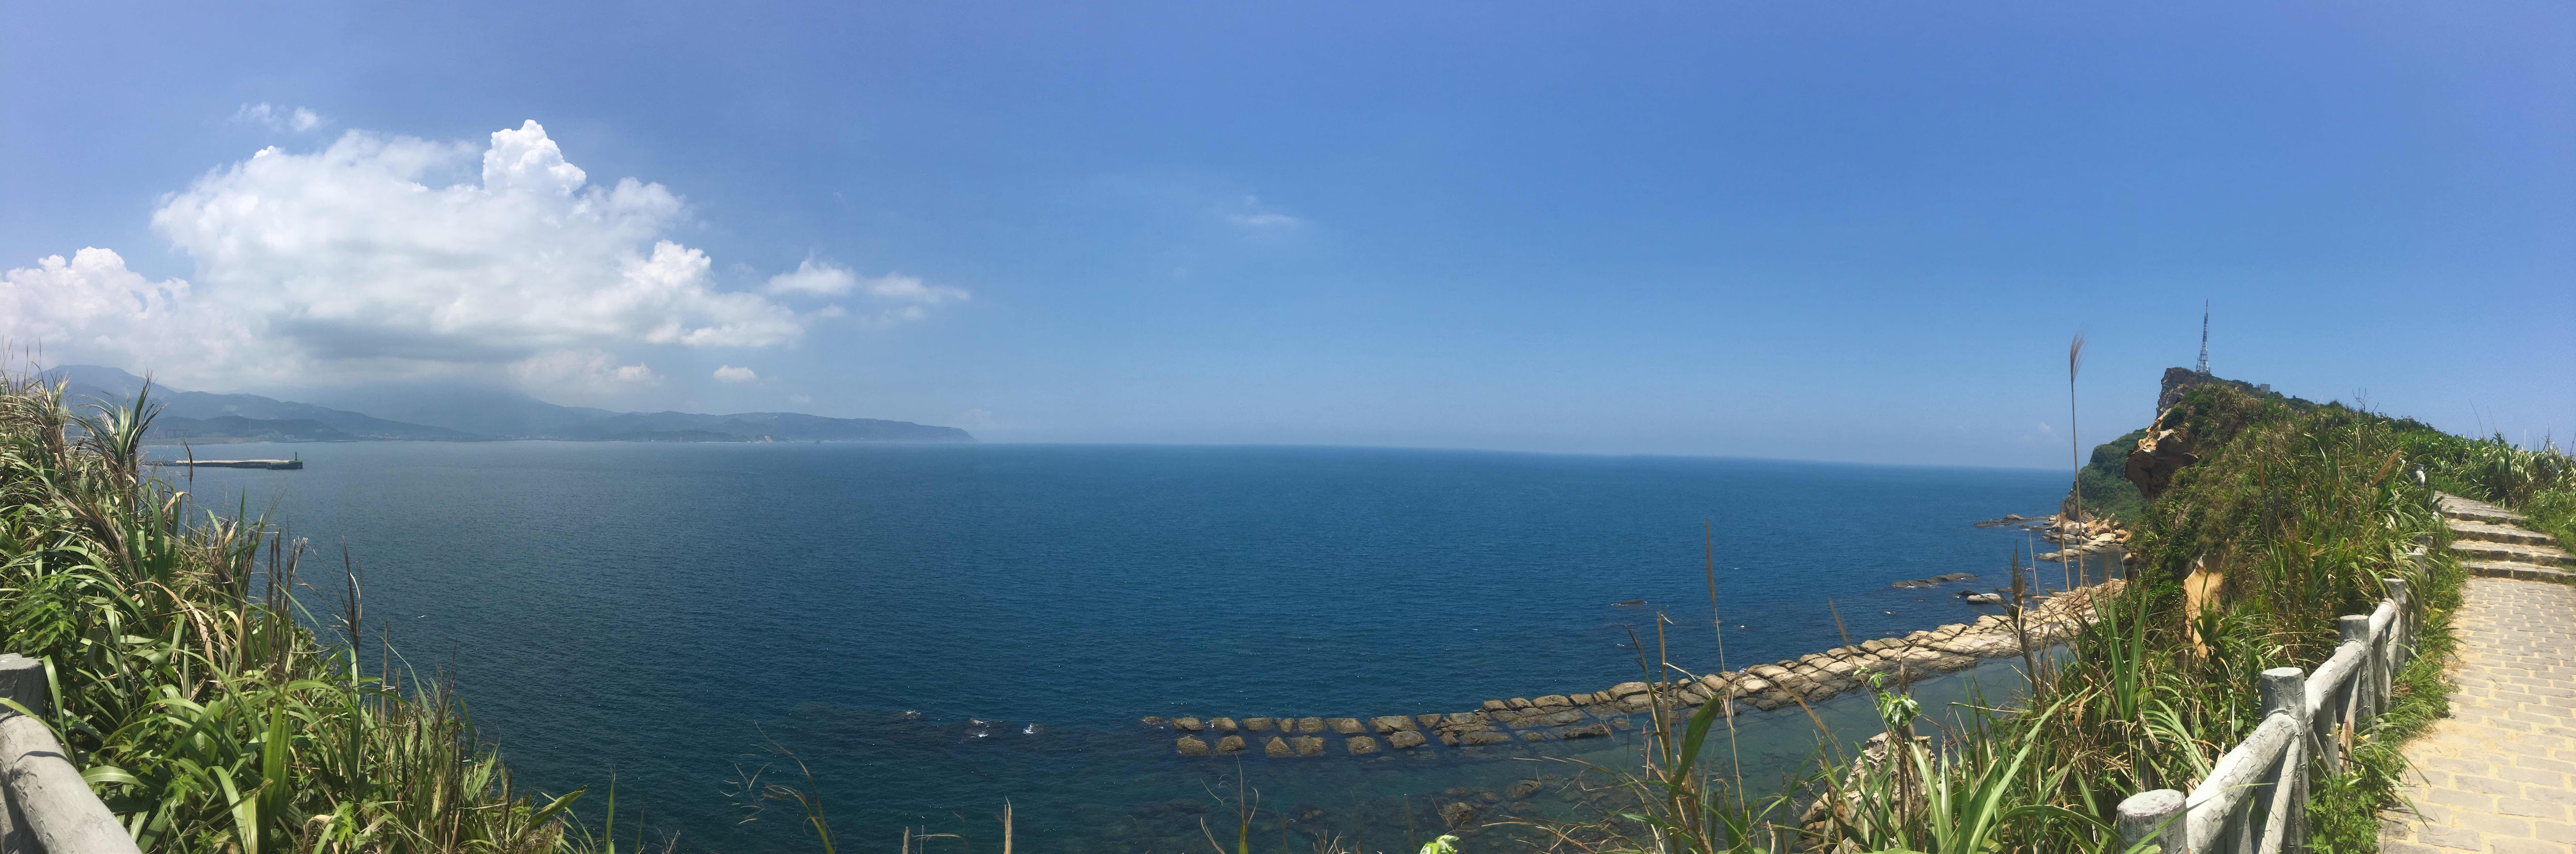 yehliu geopark queen's head yehliu peninsula north coast taipei taiwan tofu rocks